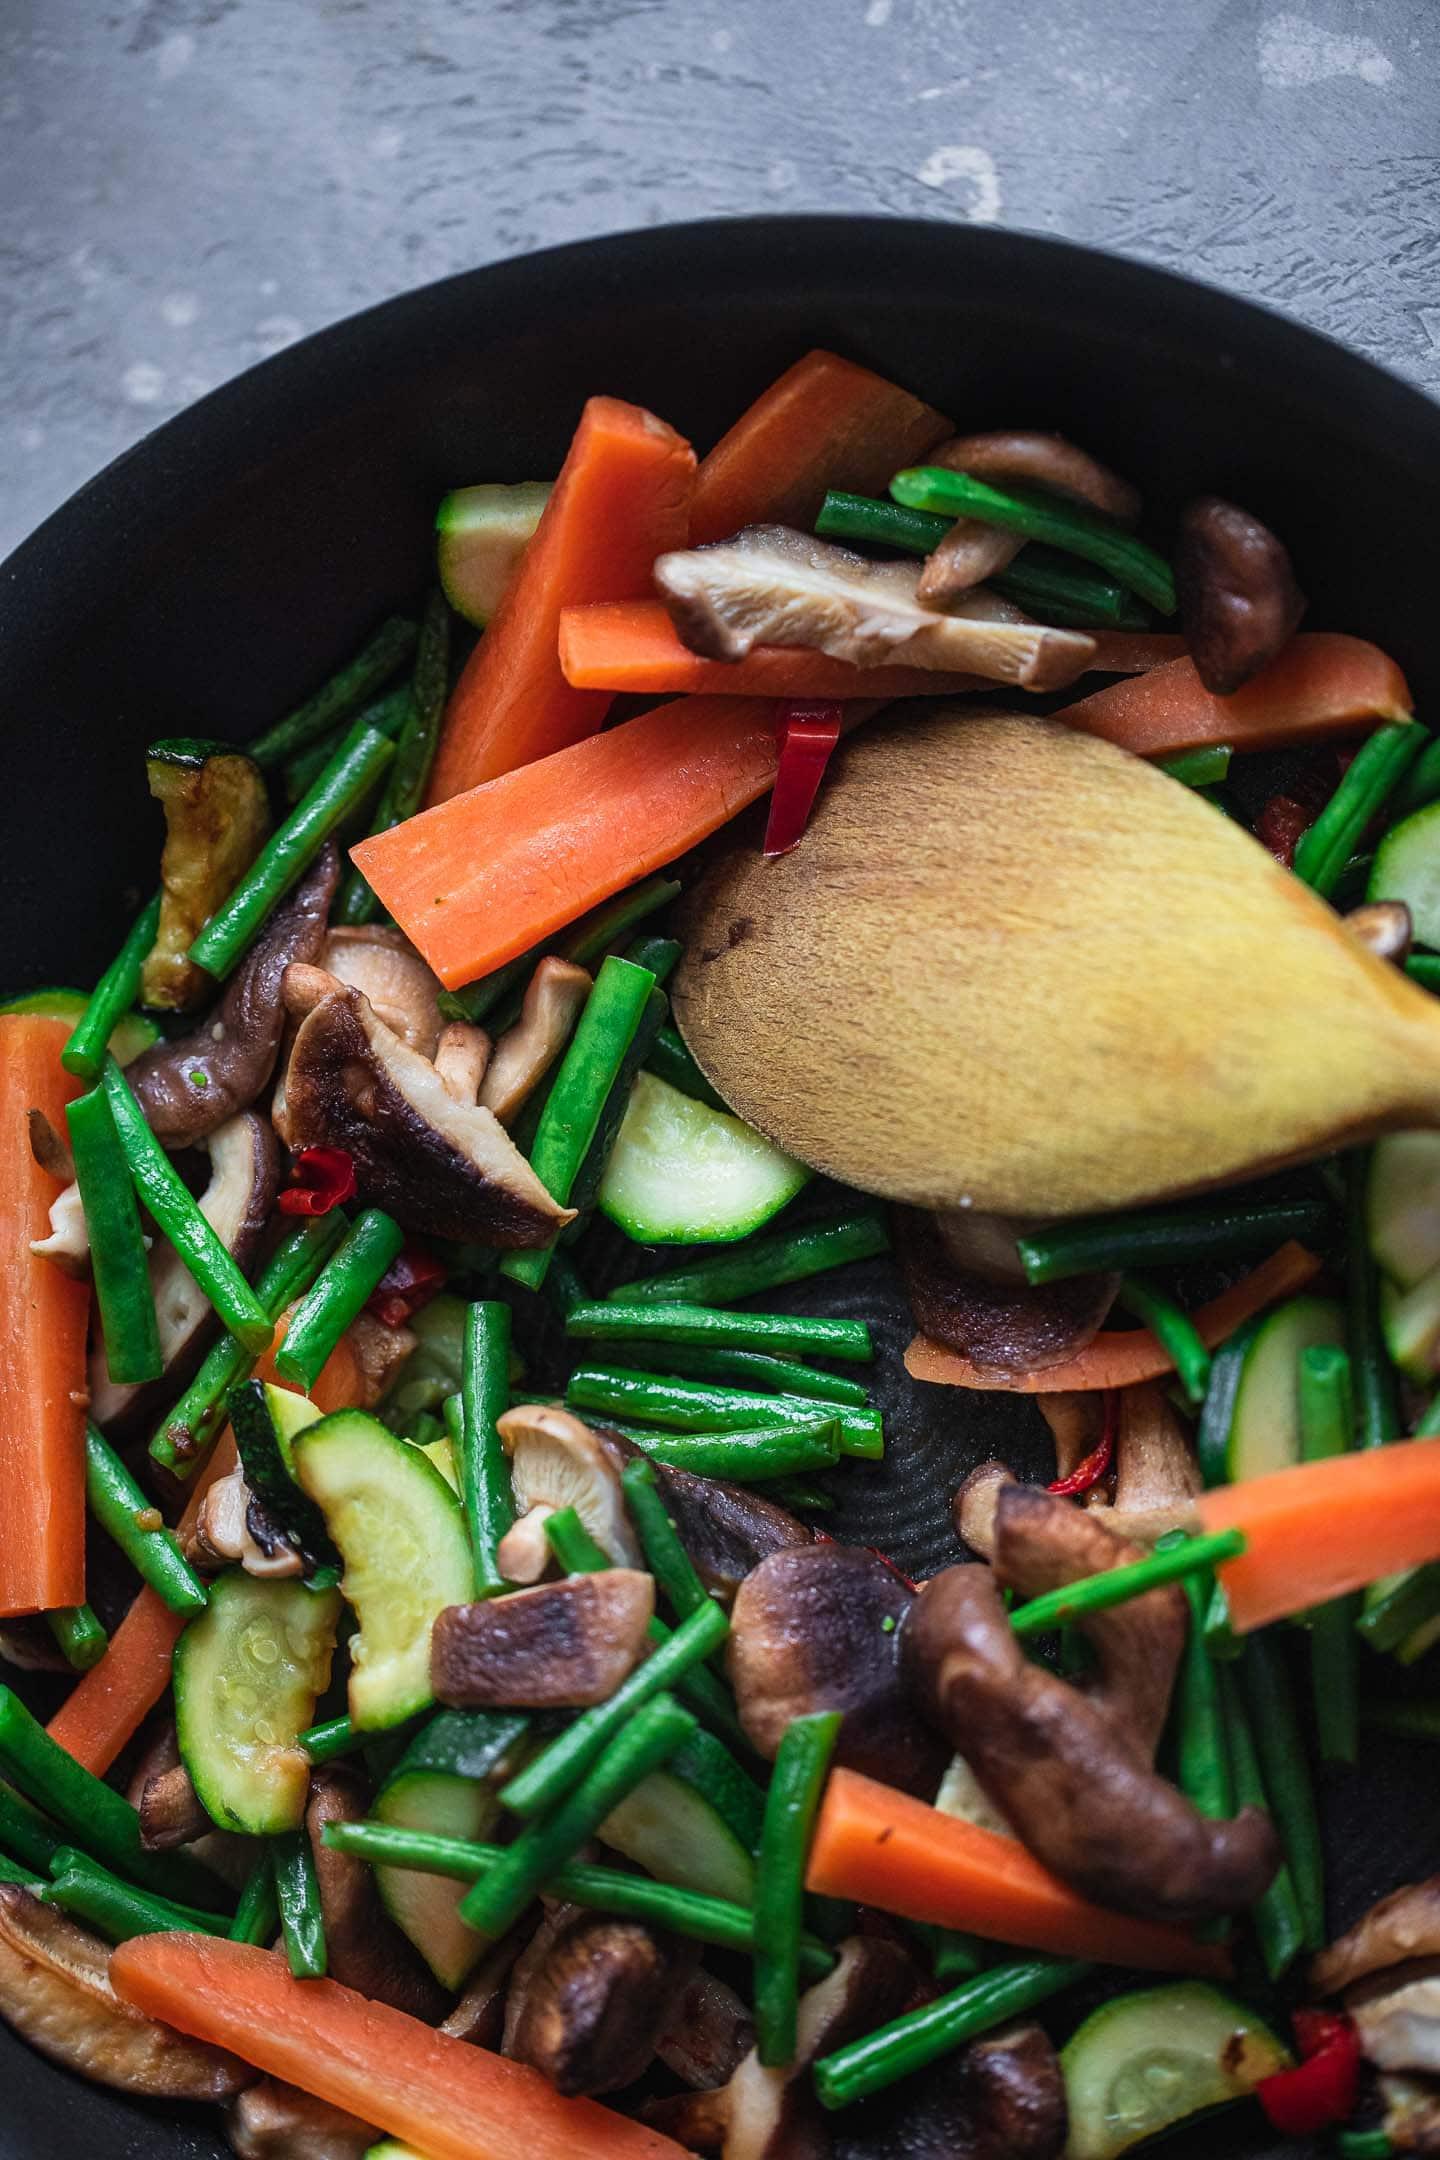 Vegetables in a pan 2